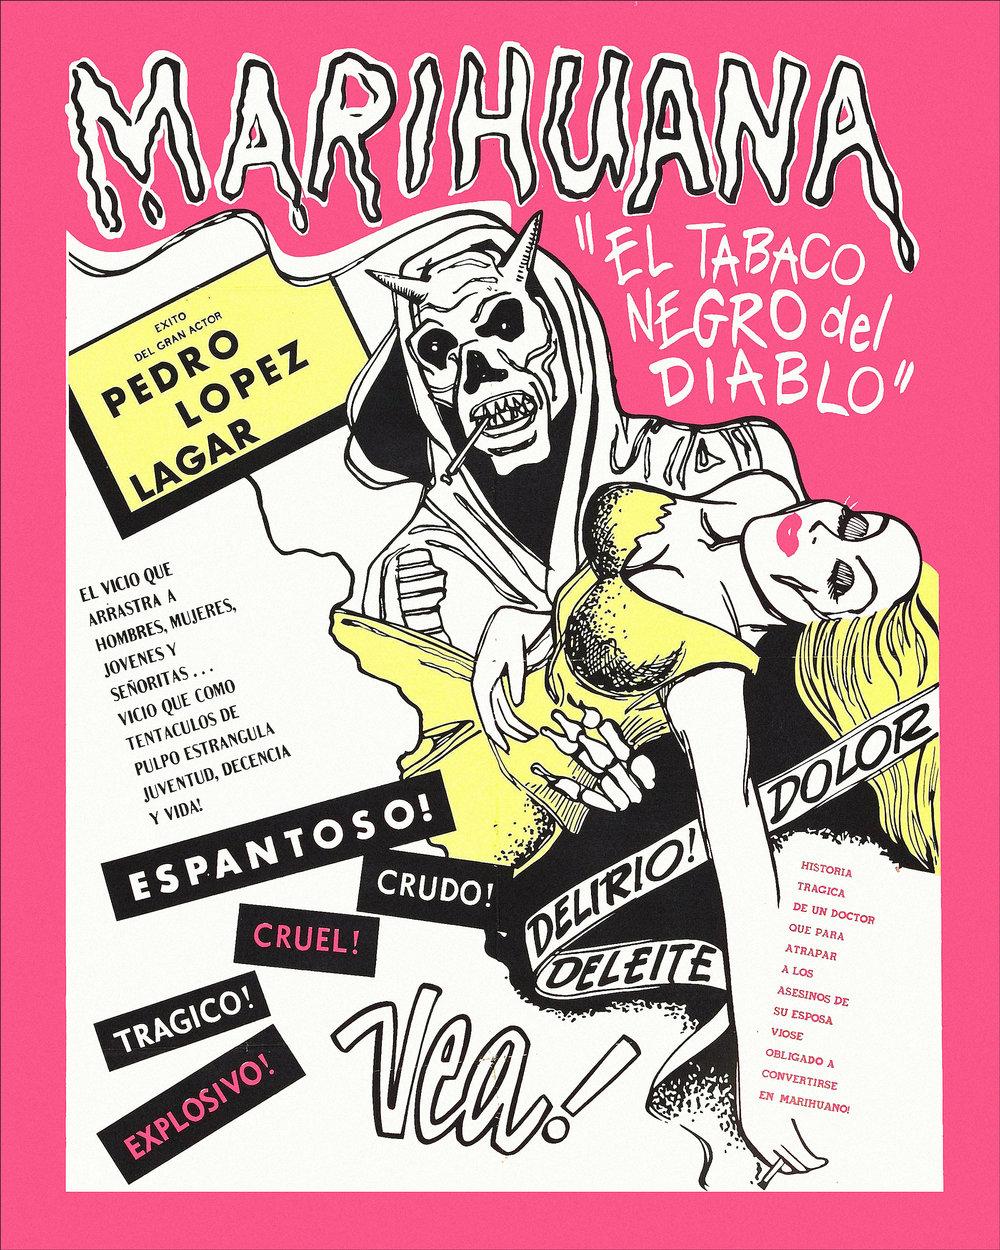 pm8_sd_dru_pink-marihuana-el-tabaco-negro-diablo-pedro.jpg